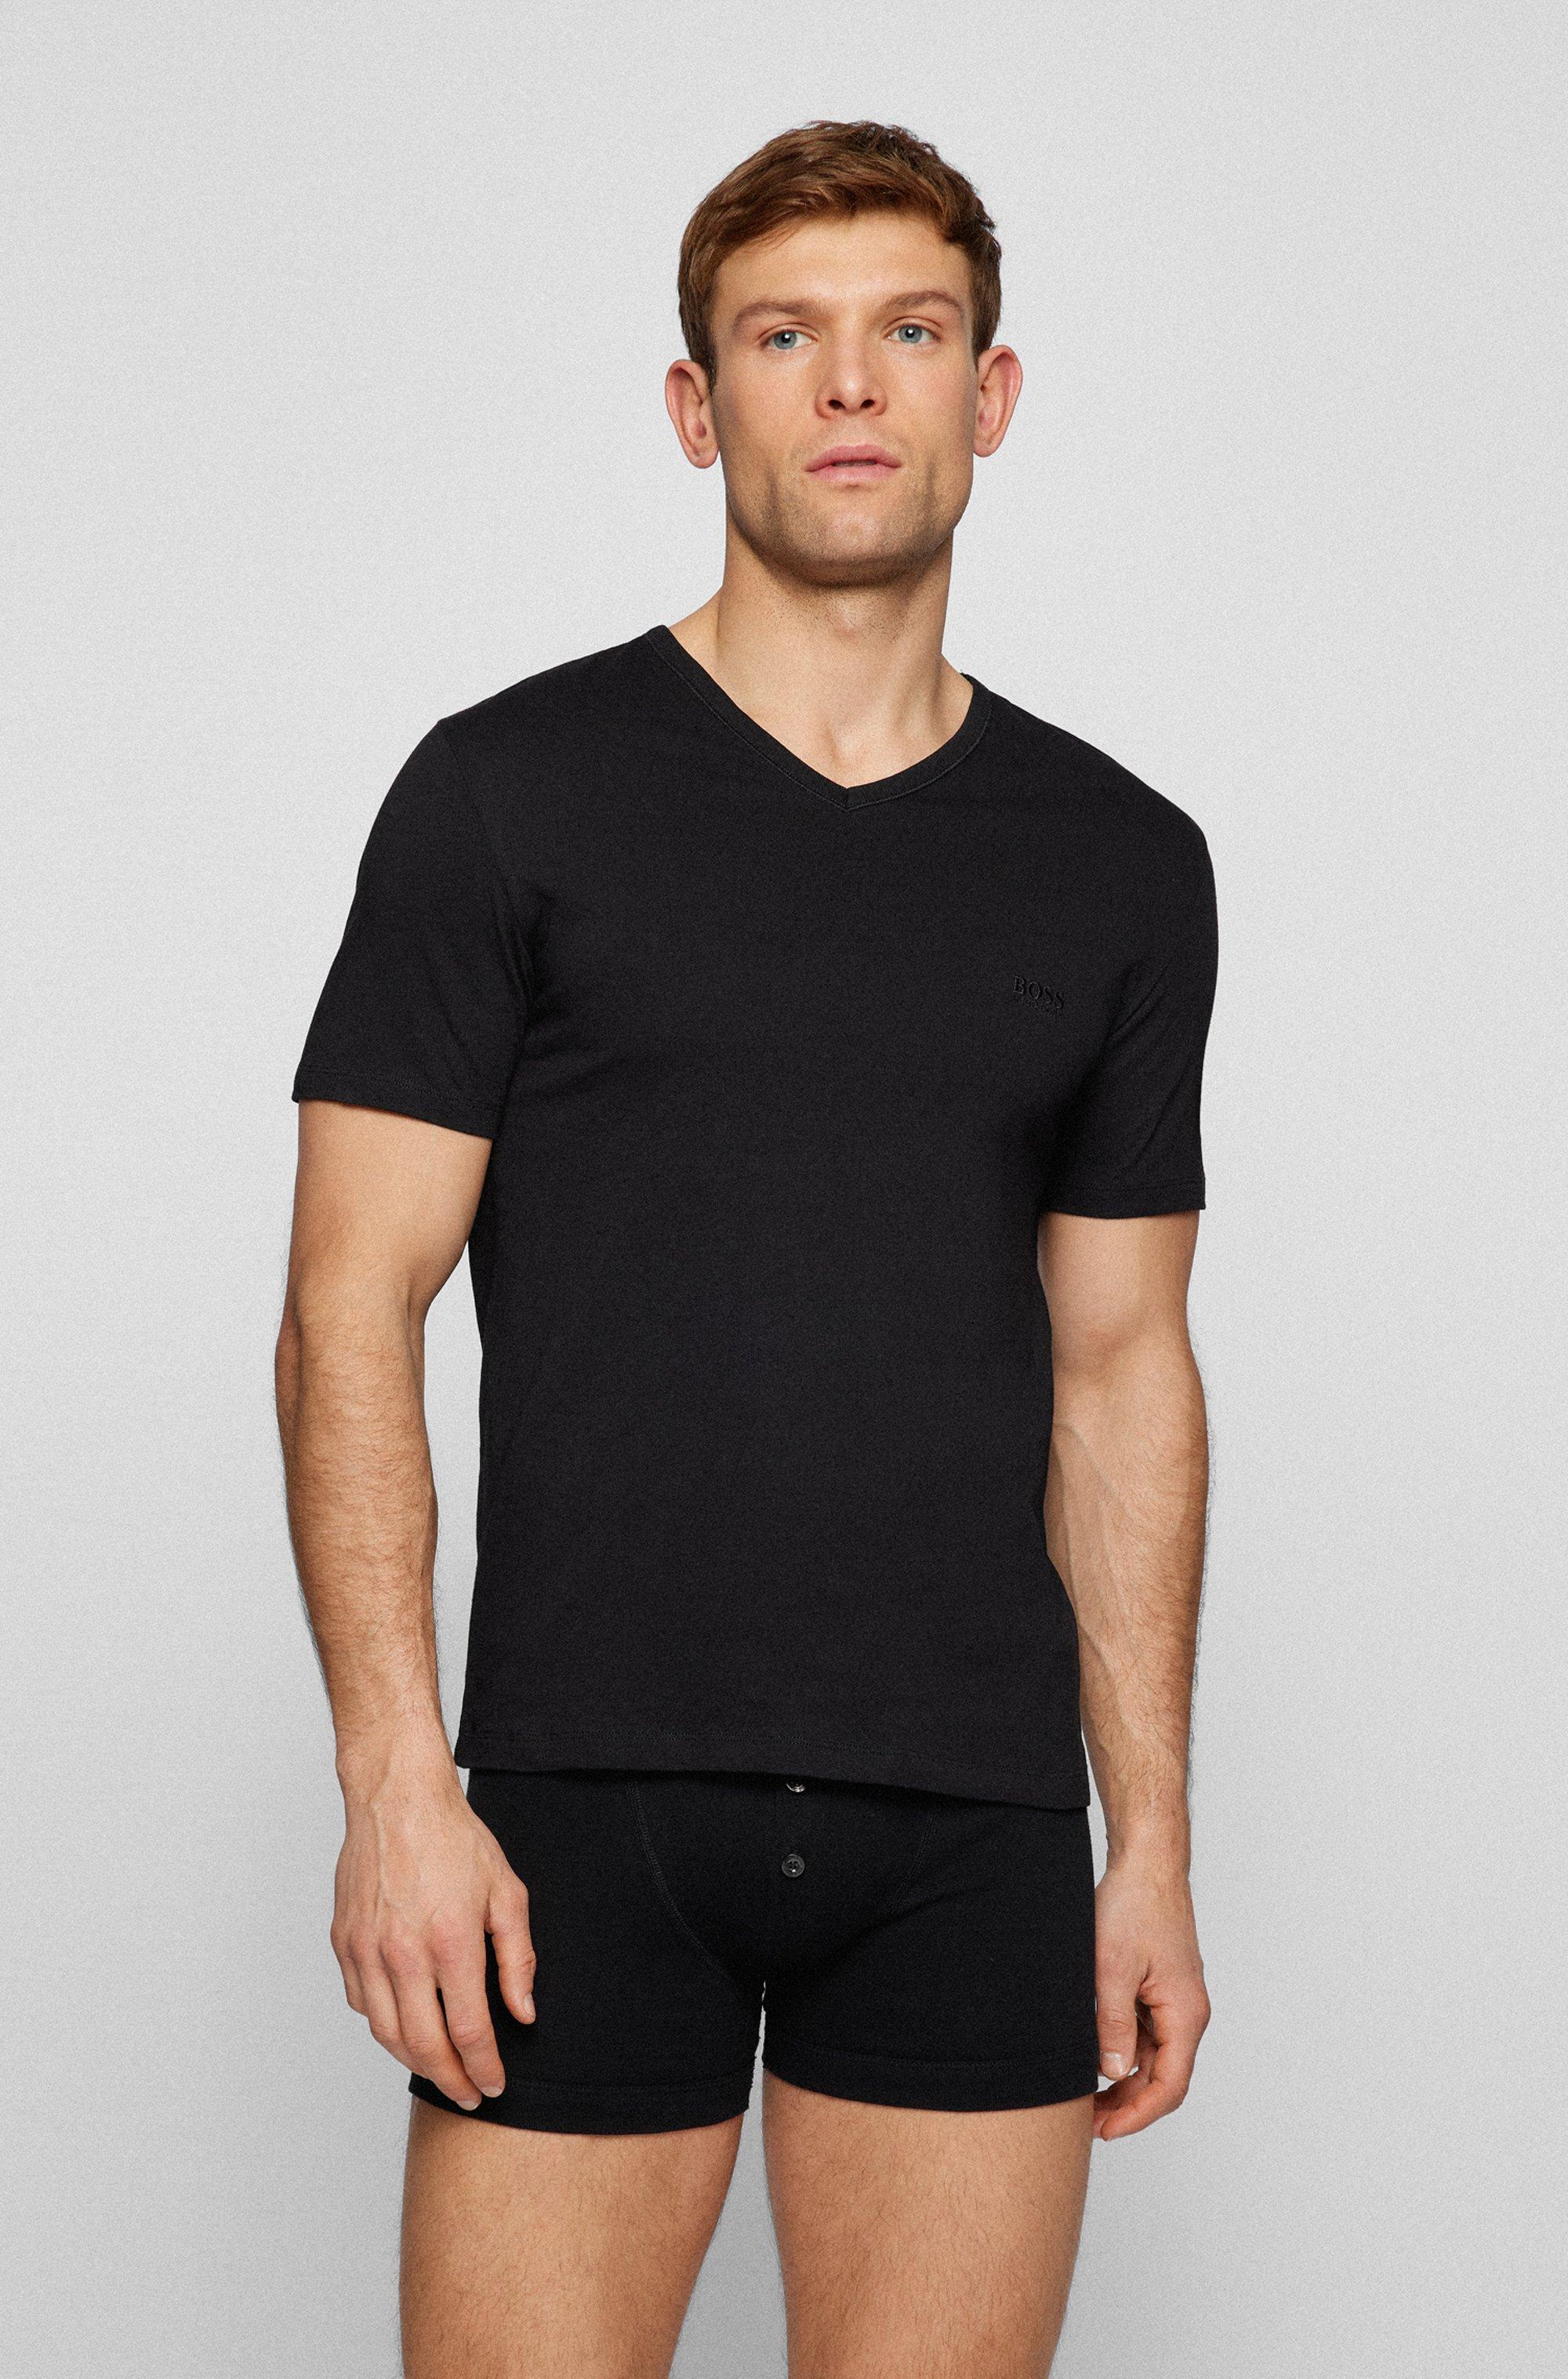 Three-pack of V-neck underwear T-shirts in cotton